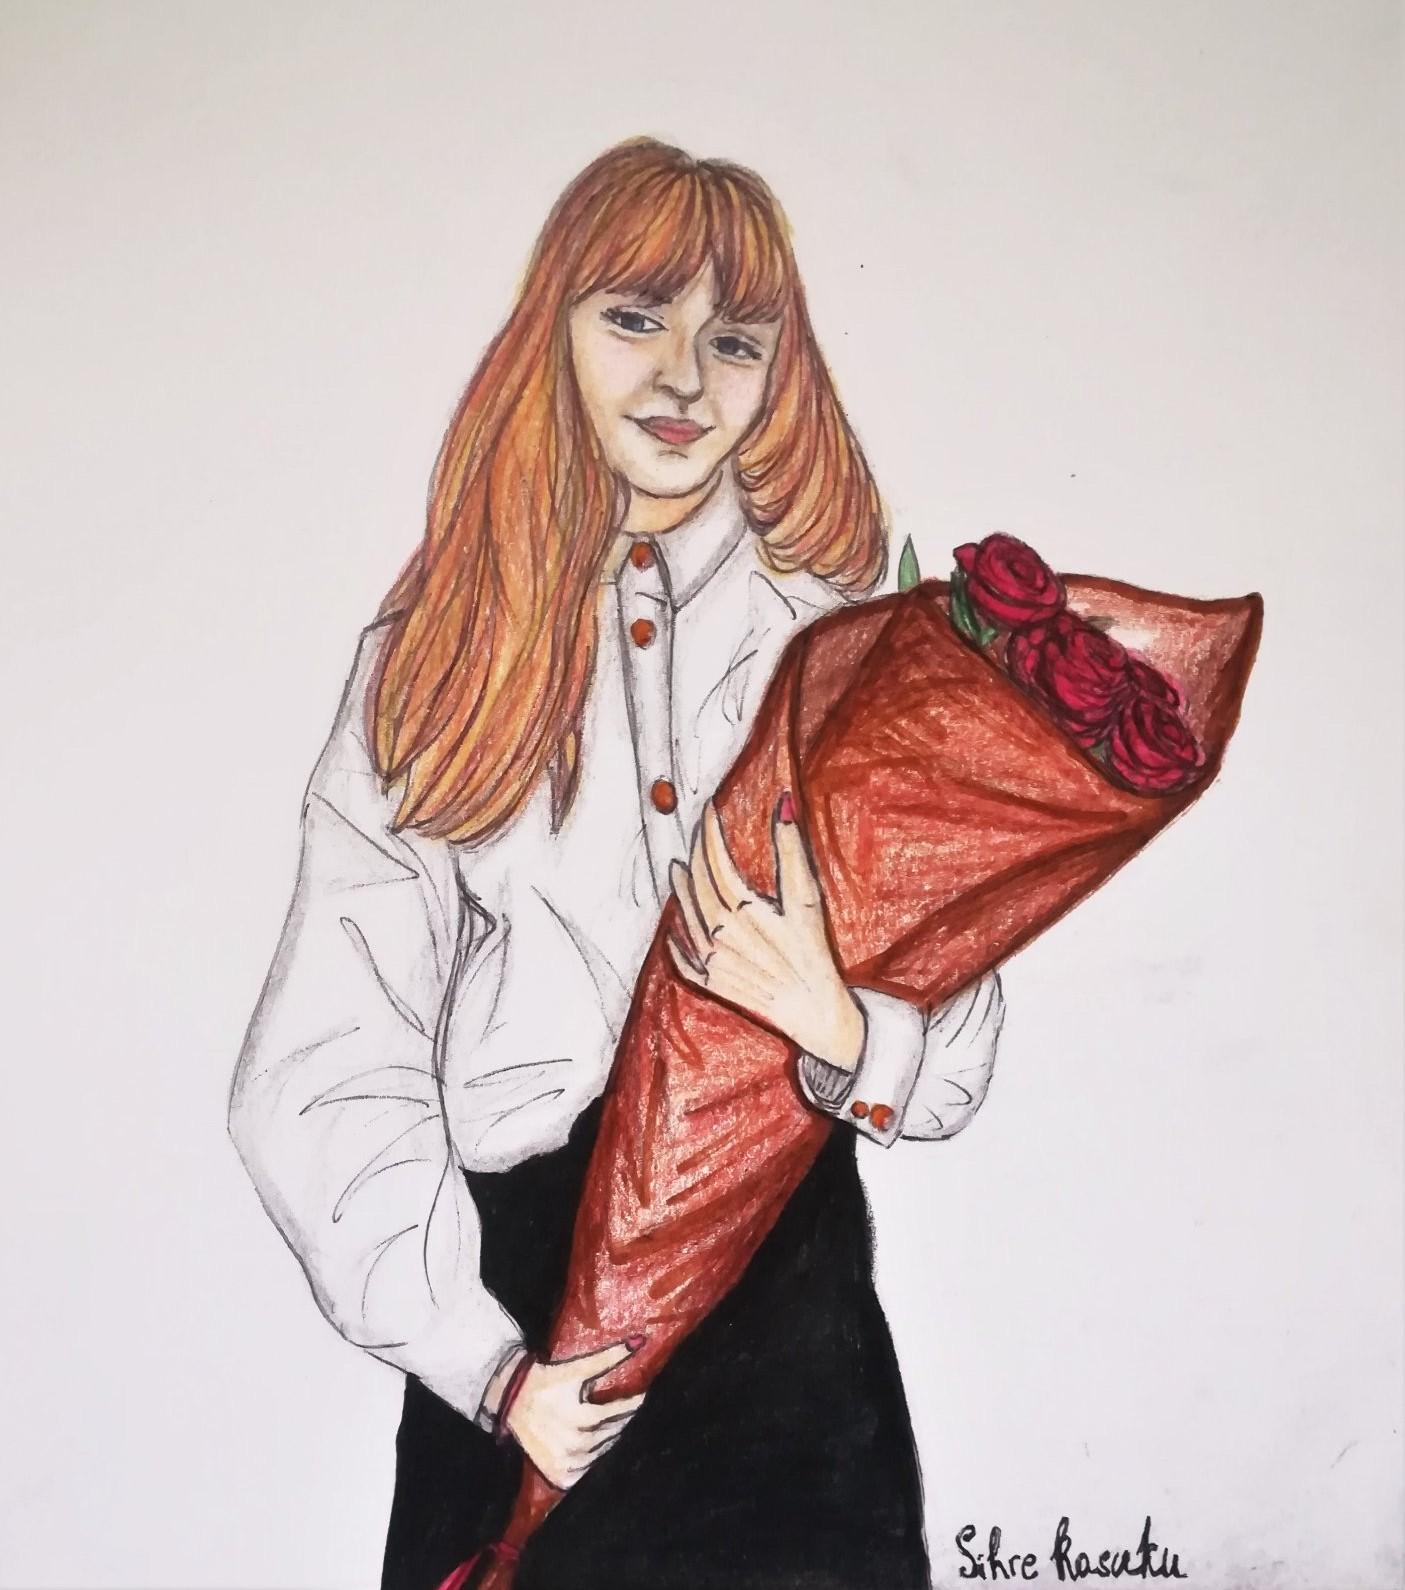 Khrystyna Krompashchyk, 16 lat, Szkoła Podstawowa nr 58